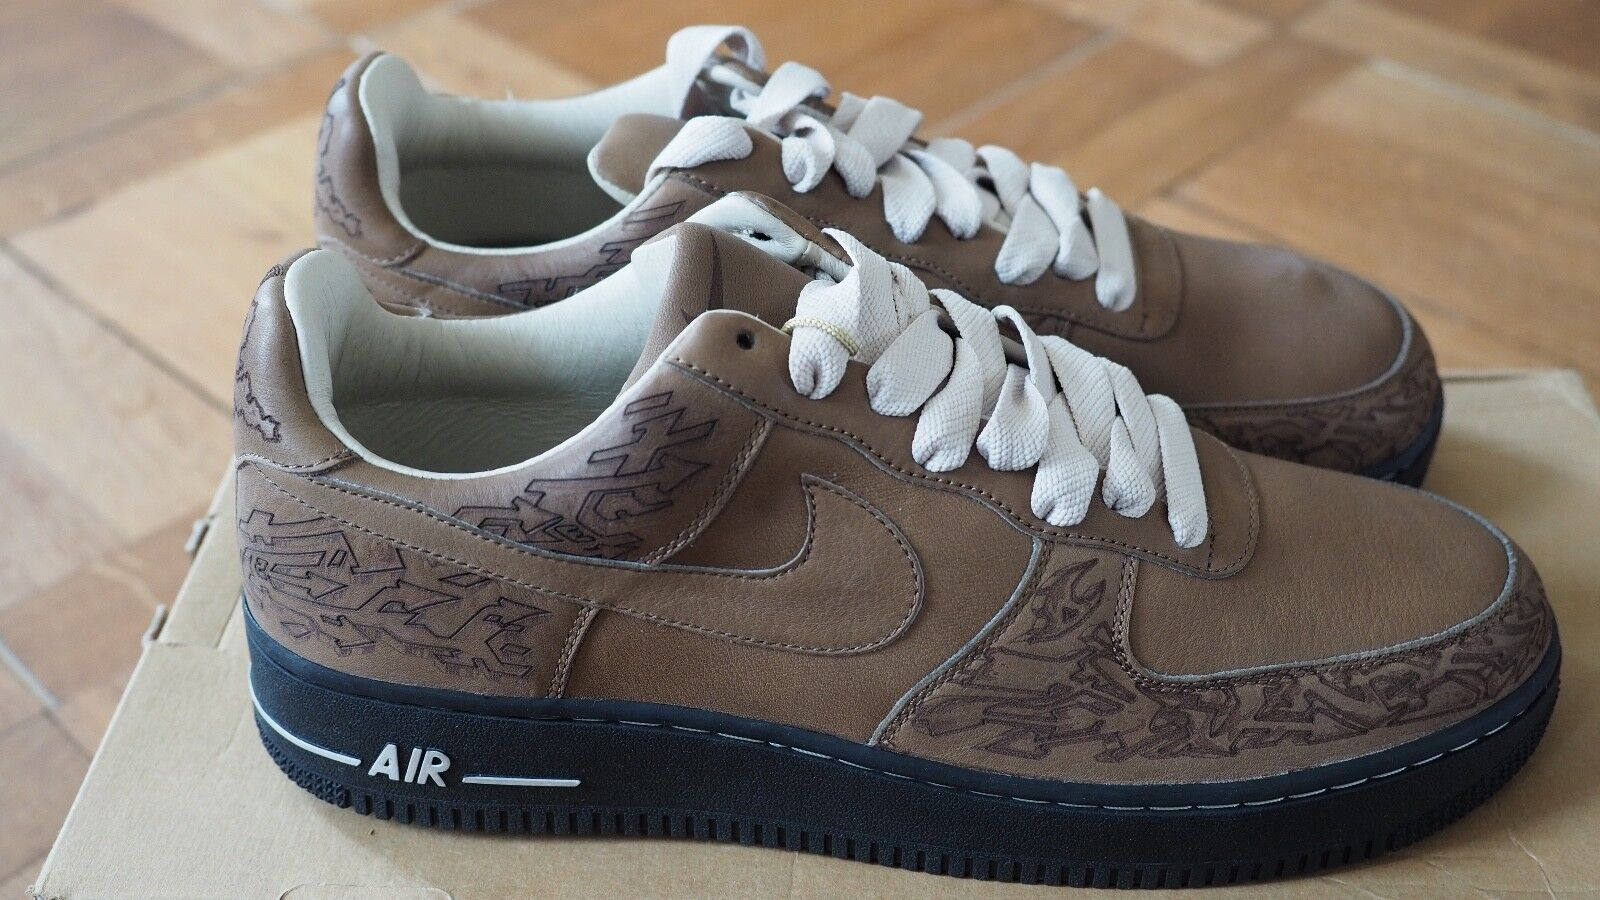 Nike Air Force I Laser 45 Stephan Maze Gr. EU 45 Laser US 11 Neu ce45c6